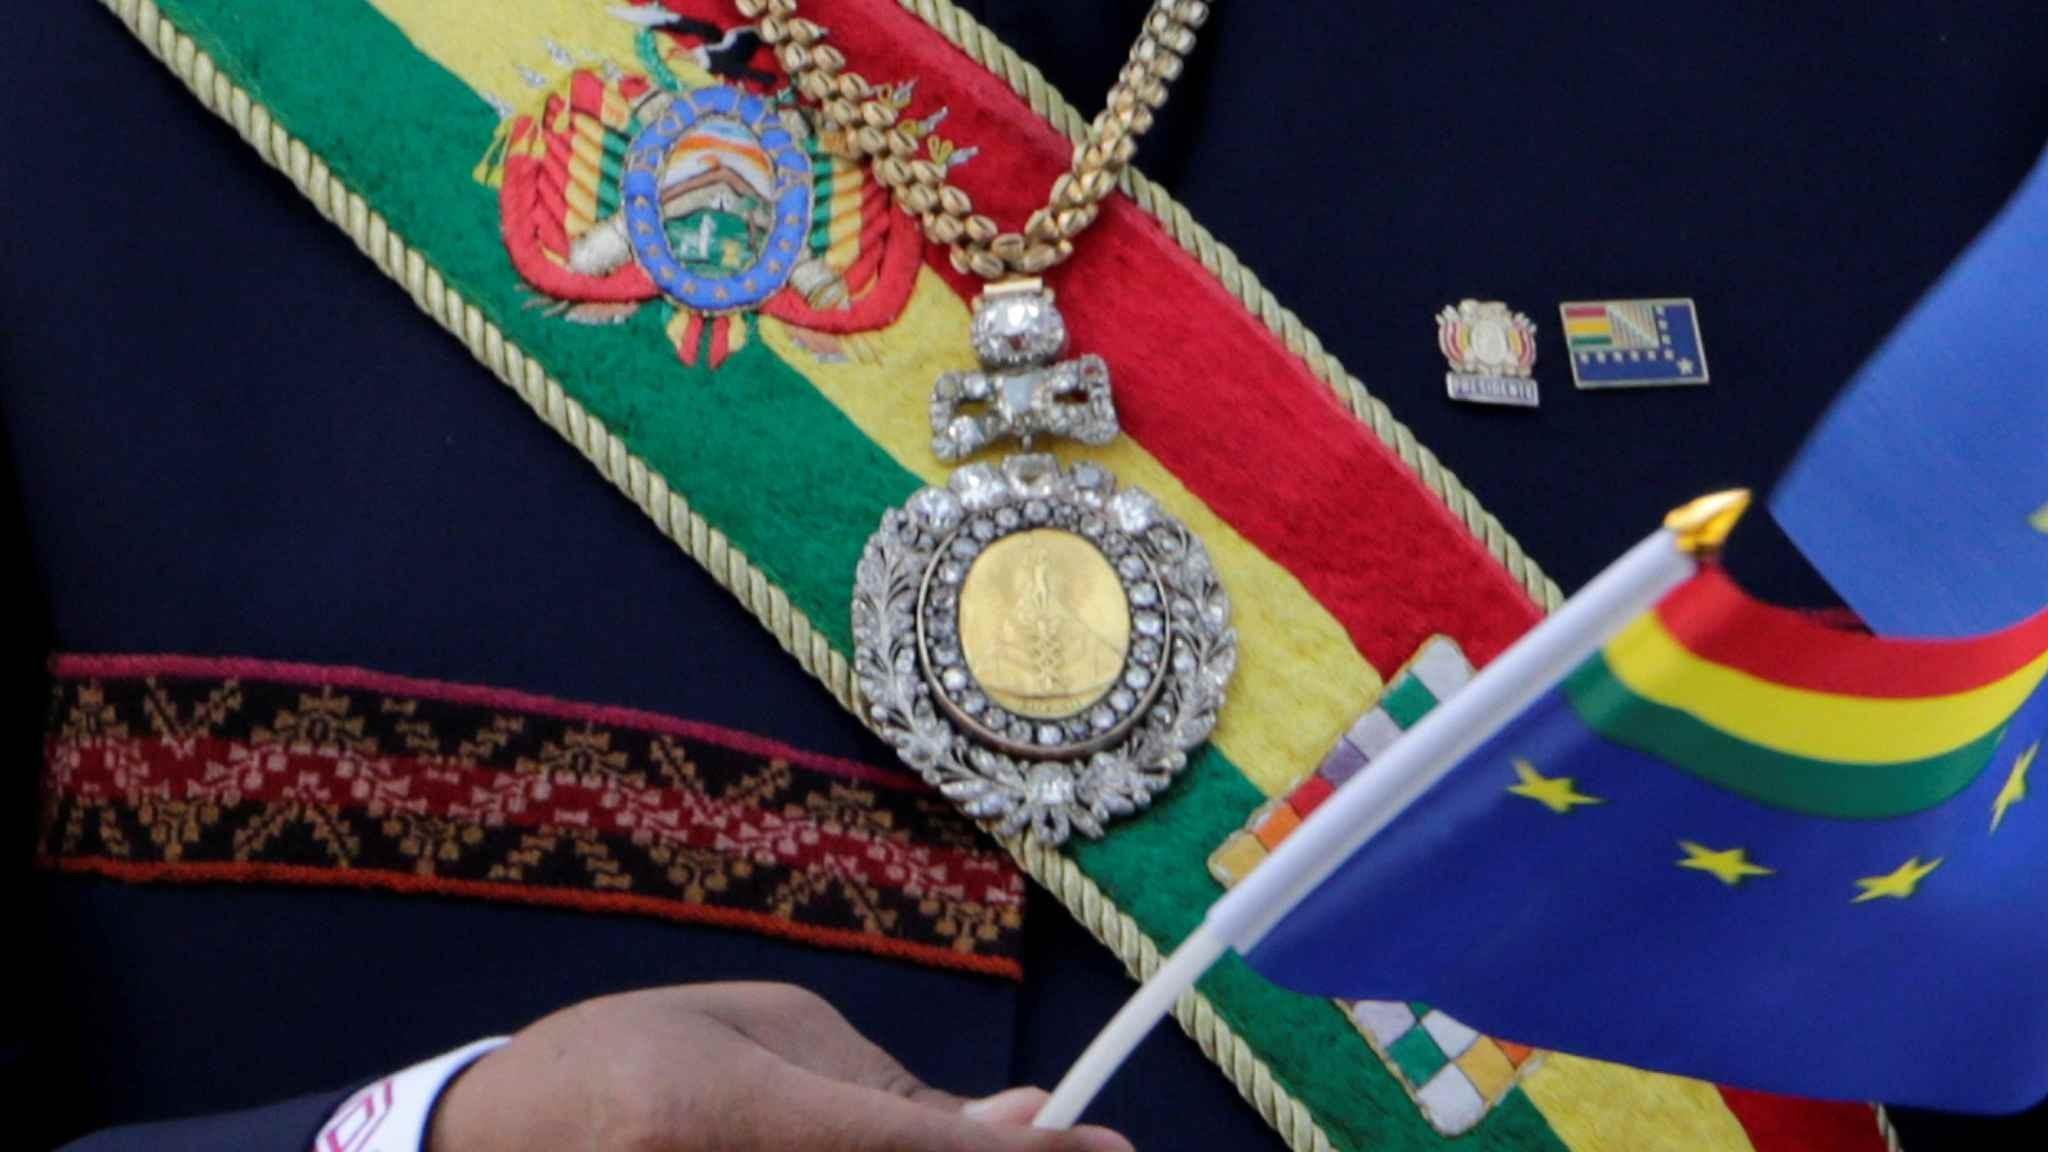 Bolivian president